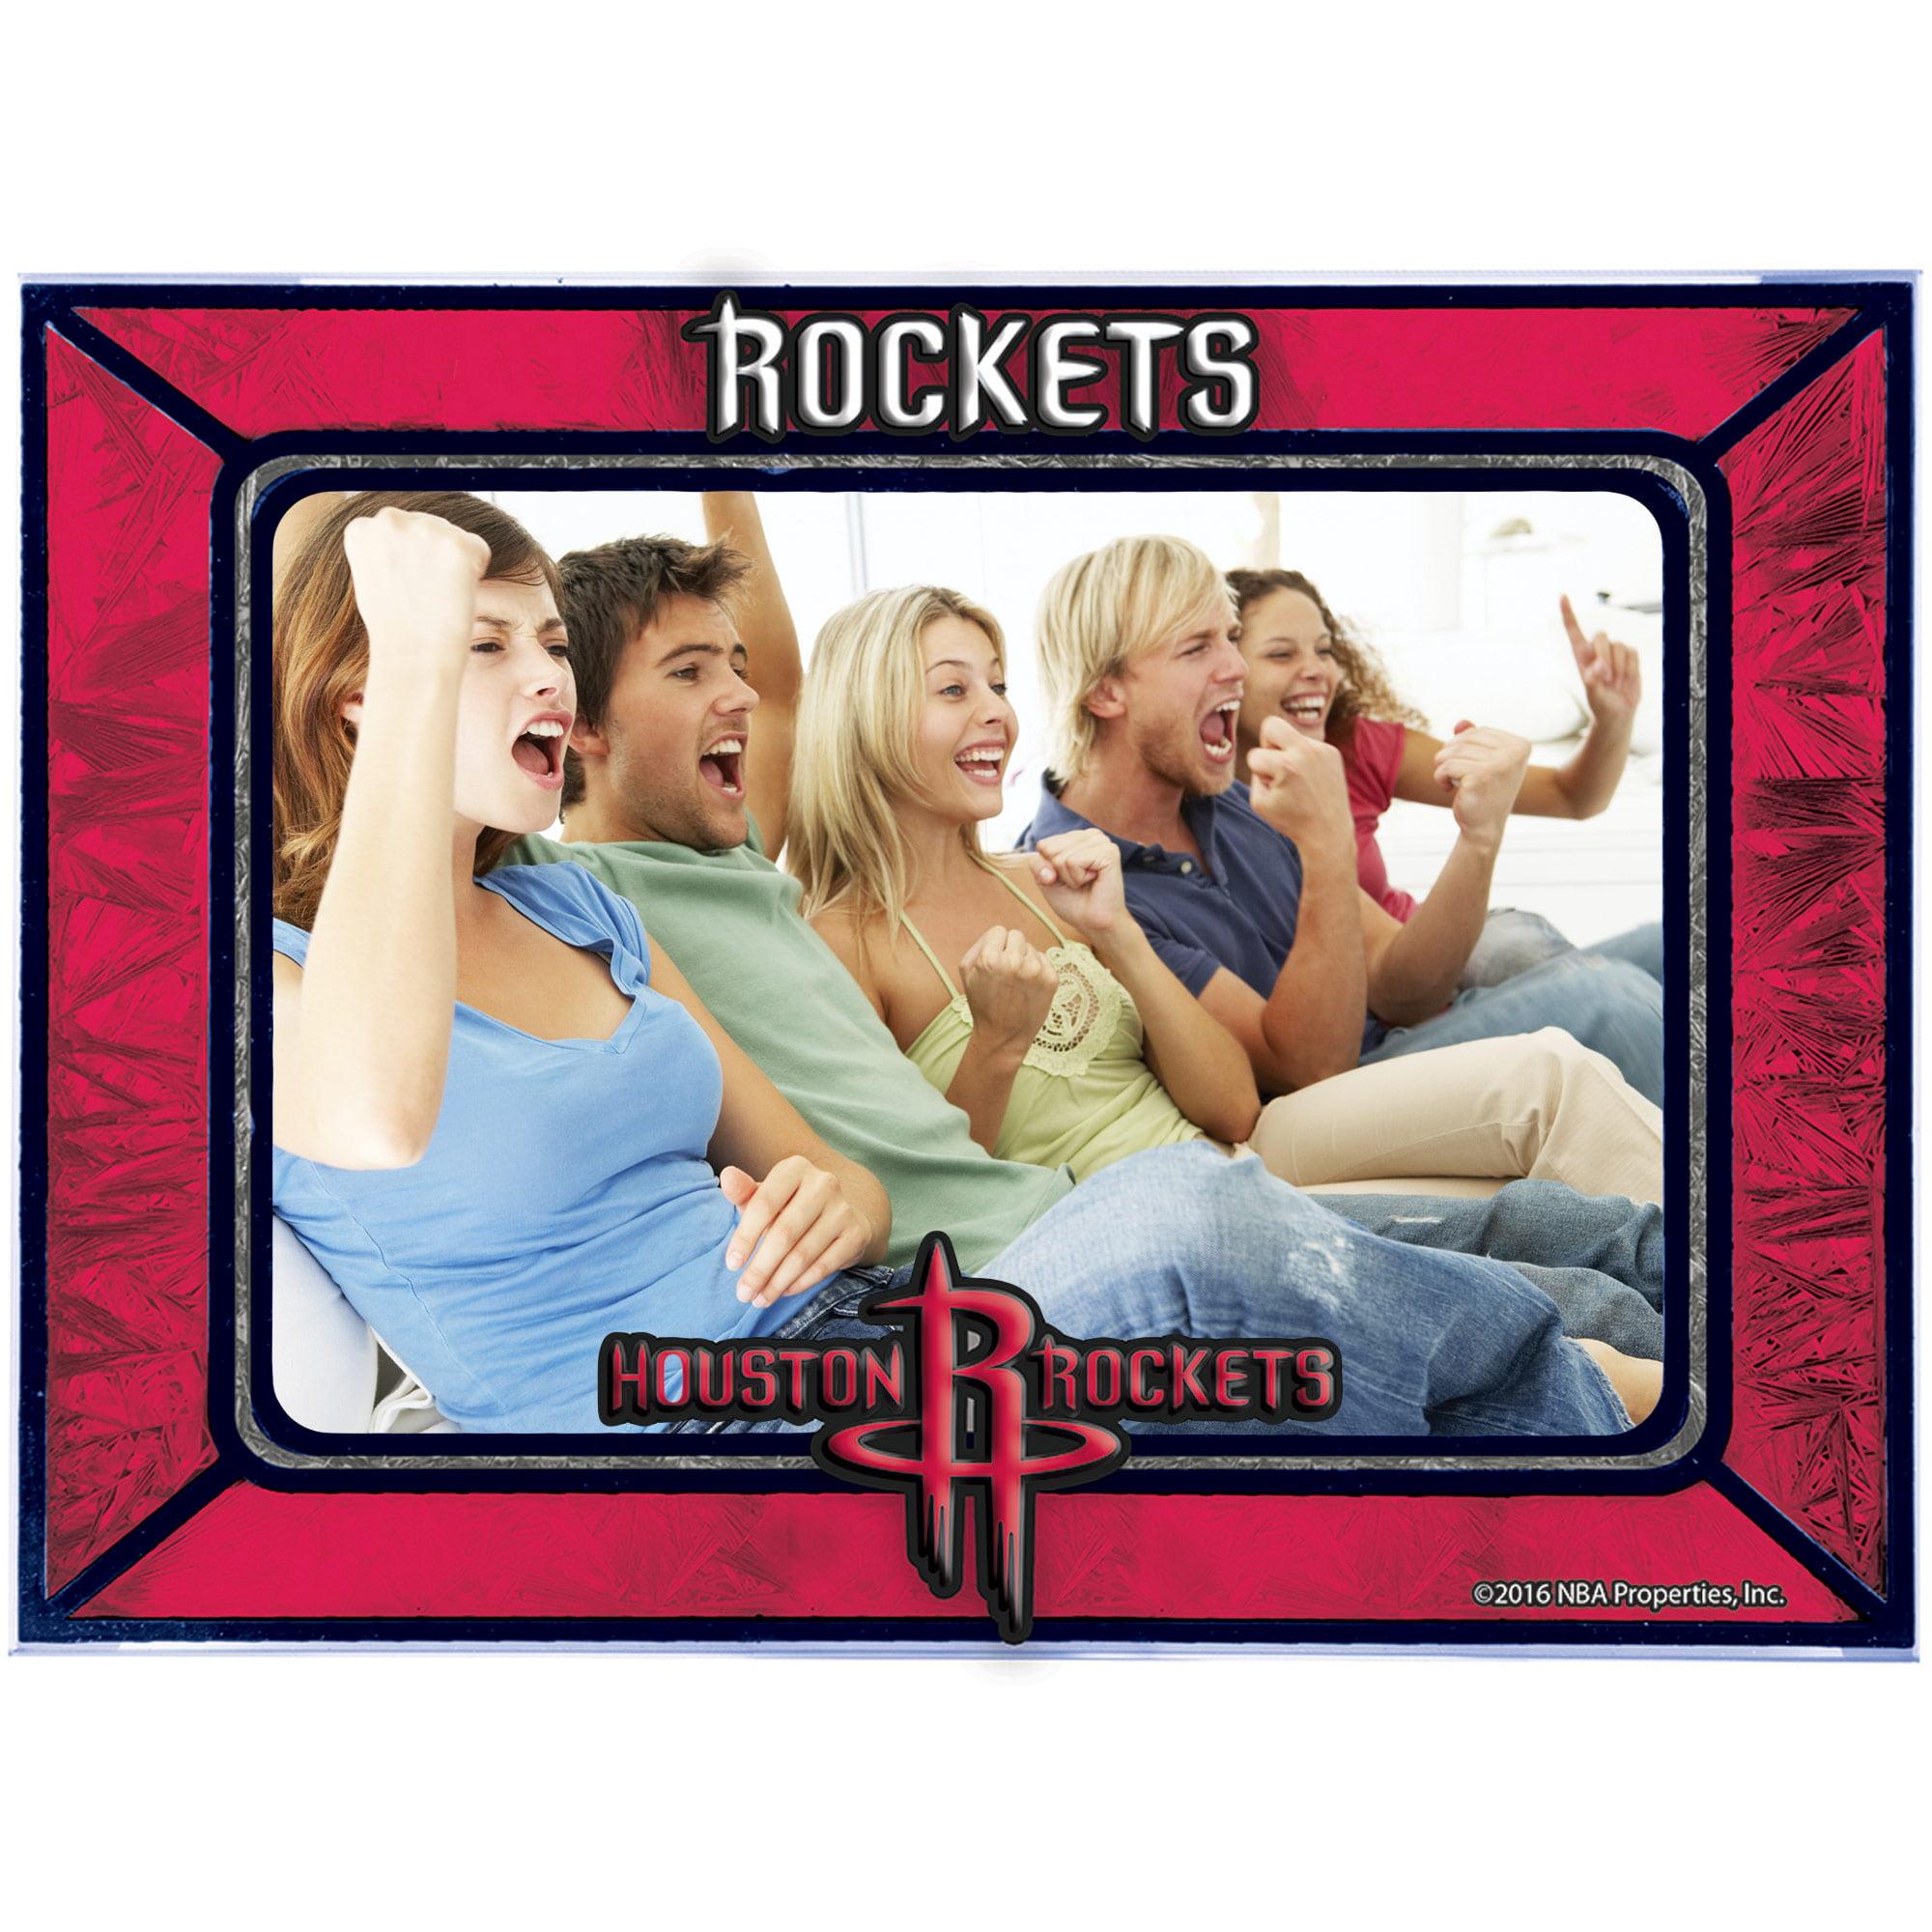 Houston Rockets Horizontal Art Glass Frame - No Size